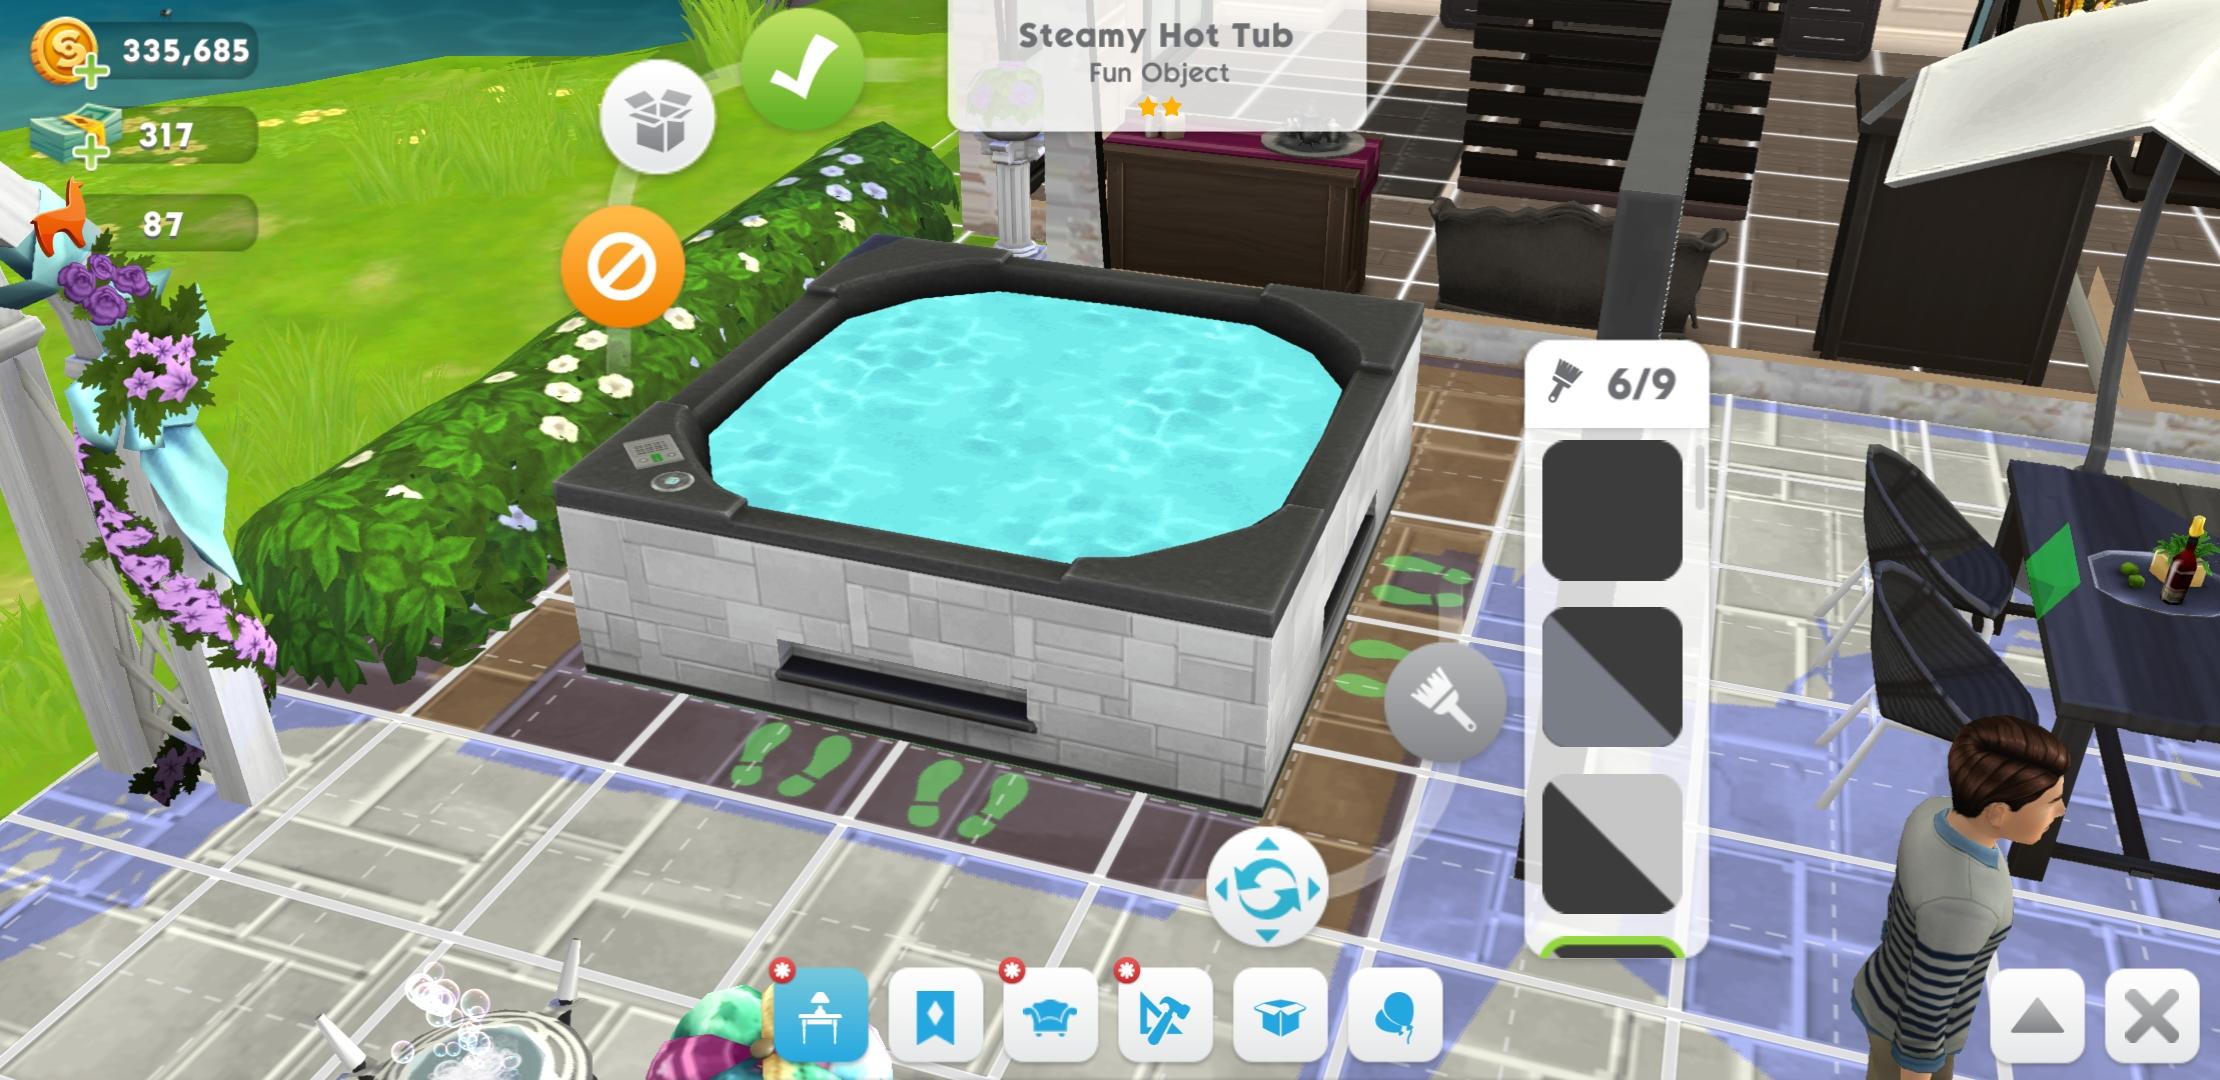 Screenshot_20190330-144807_The Sims.jpg